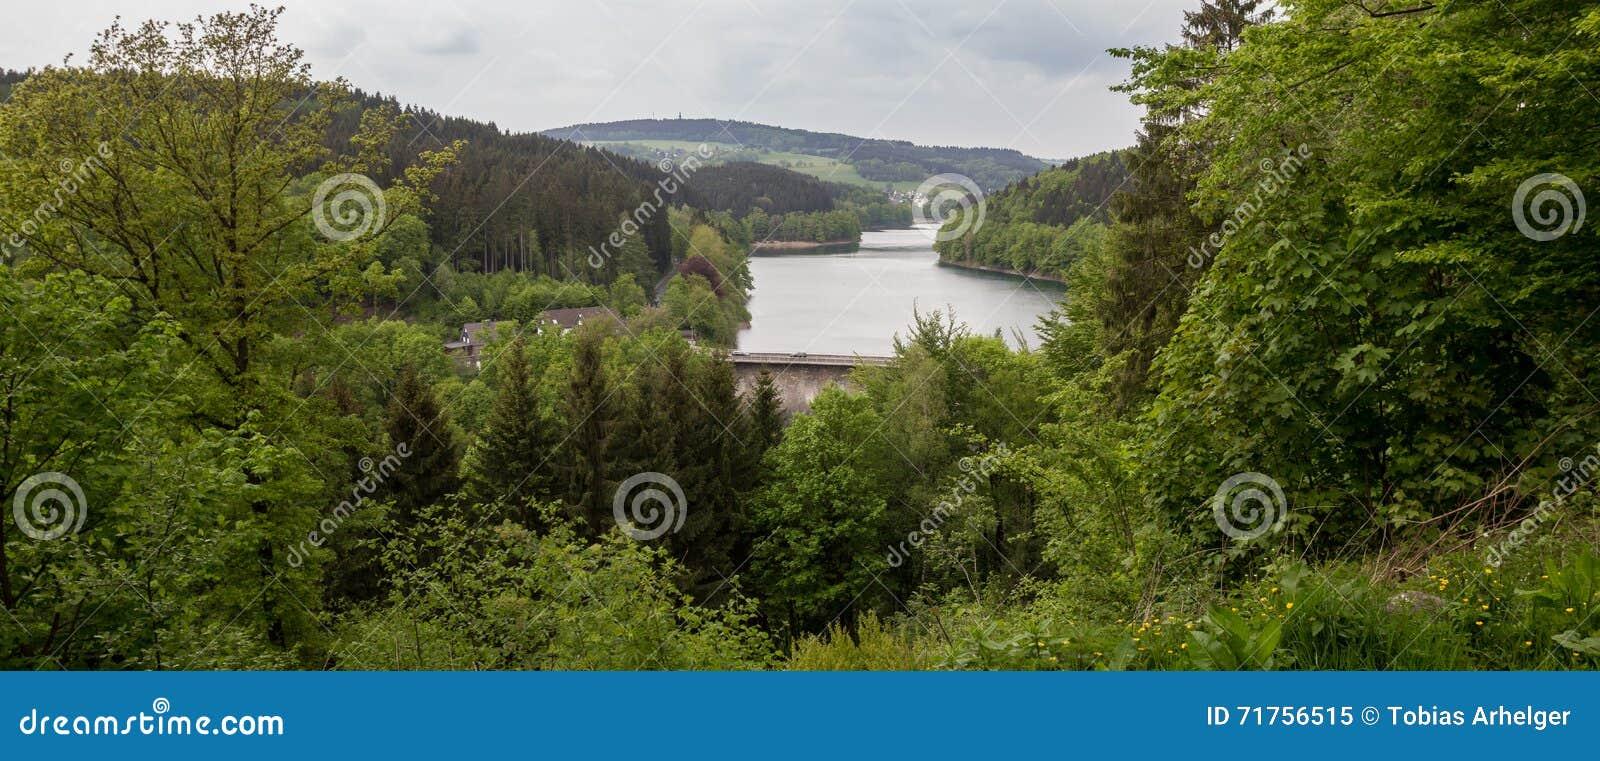 Aggertalsperre Γερμανία